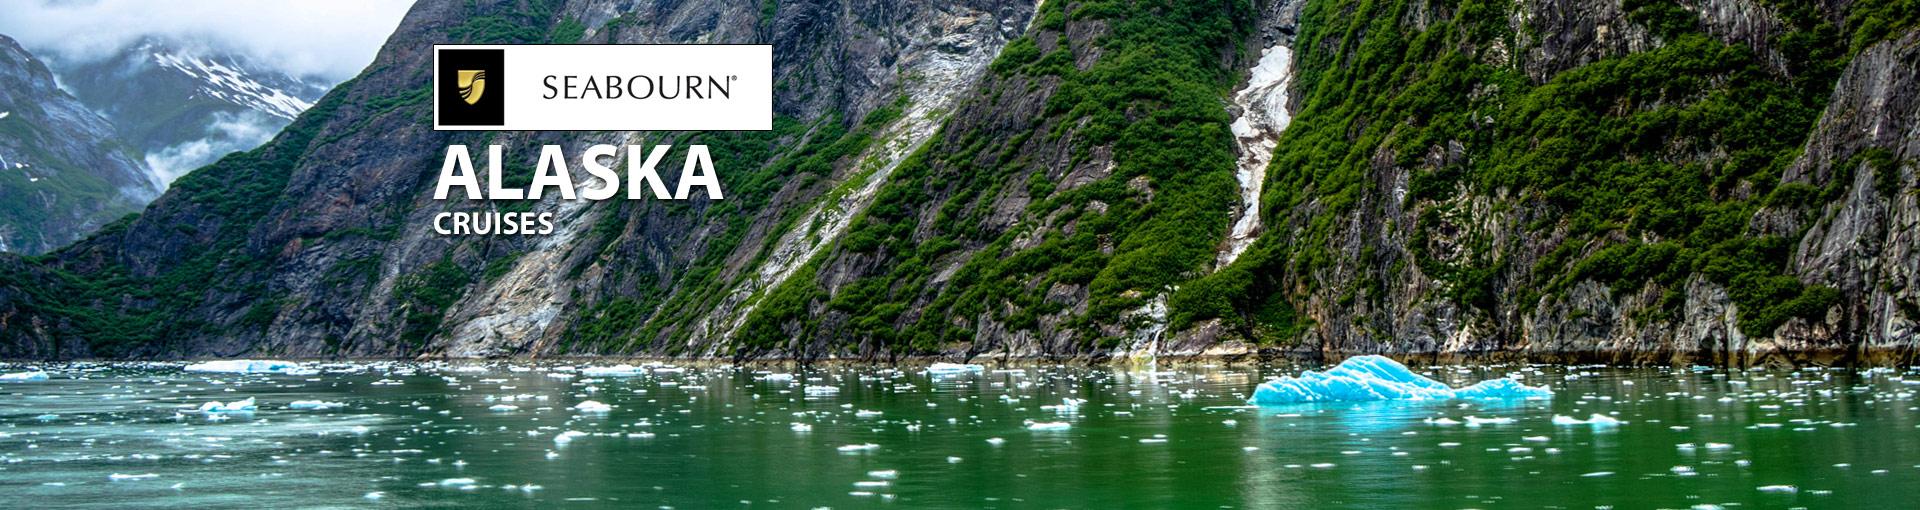 Seabourn Cruise Line Alaska Cruises